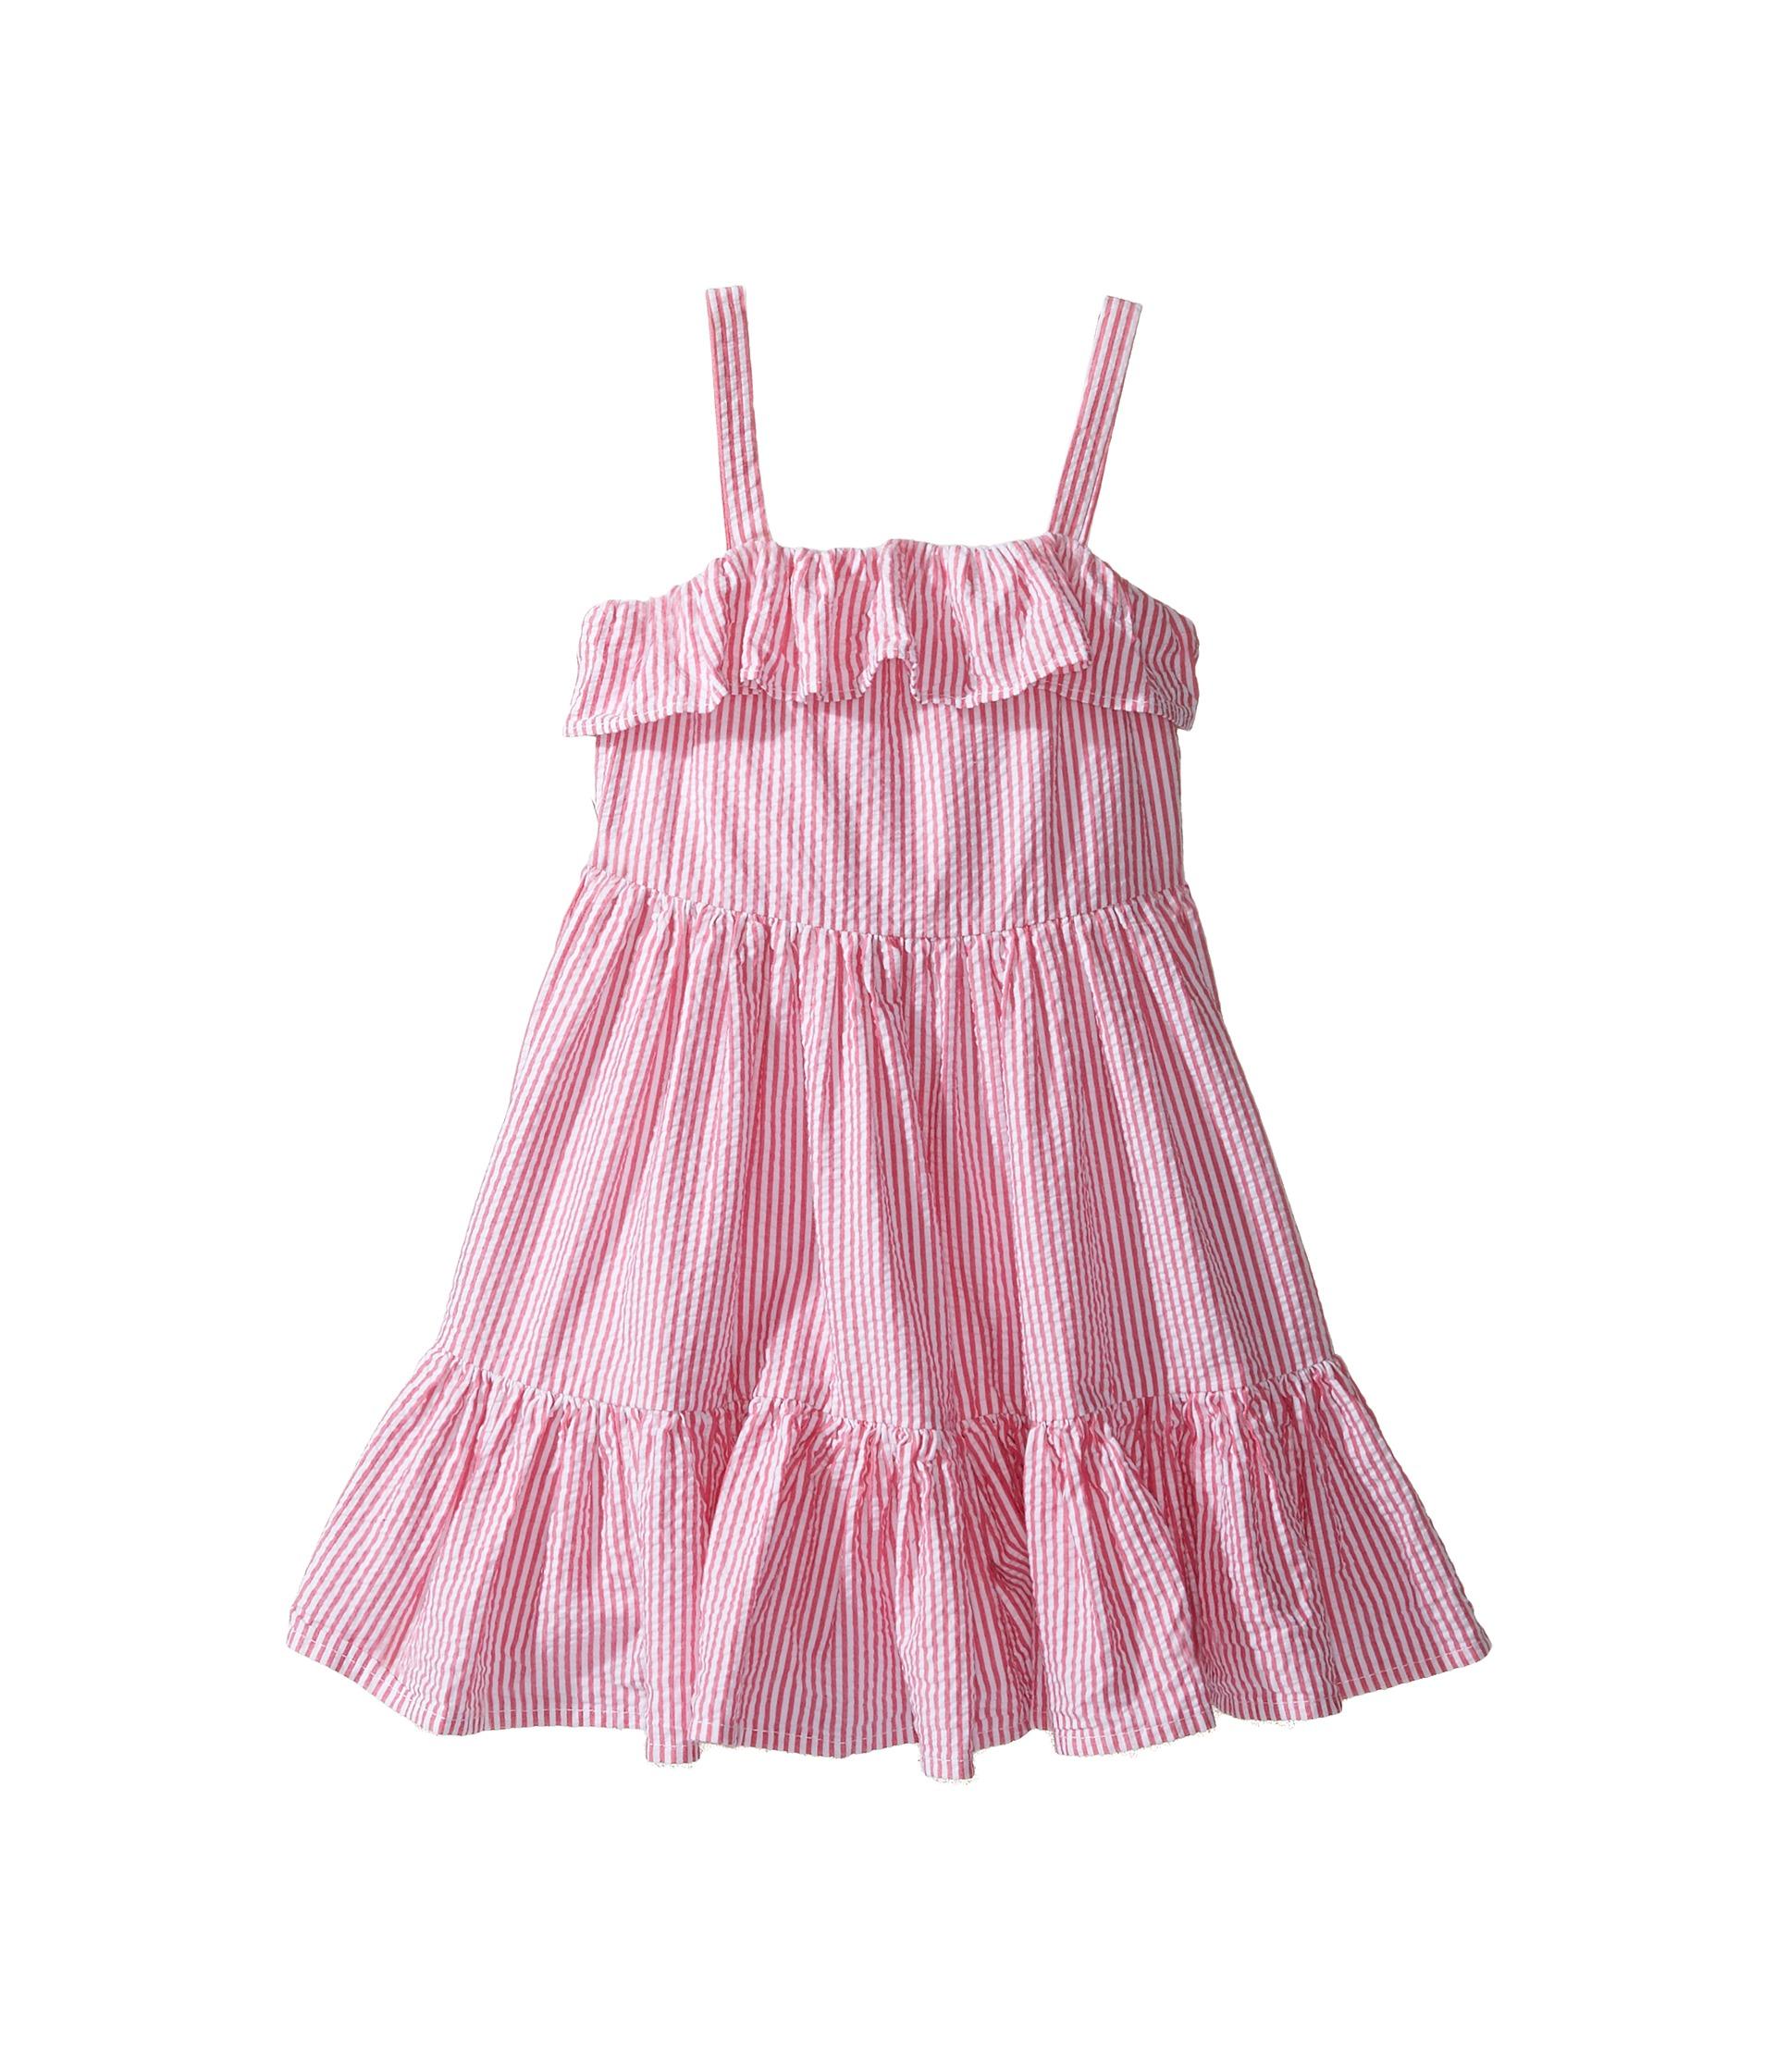 Polo Ralph Lauren Kids Seersucker Dress Toddler Pink